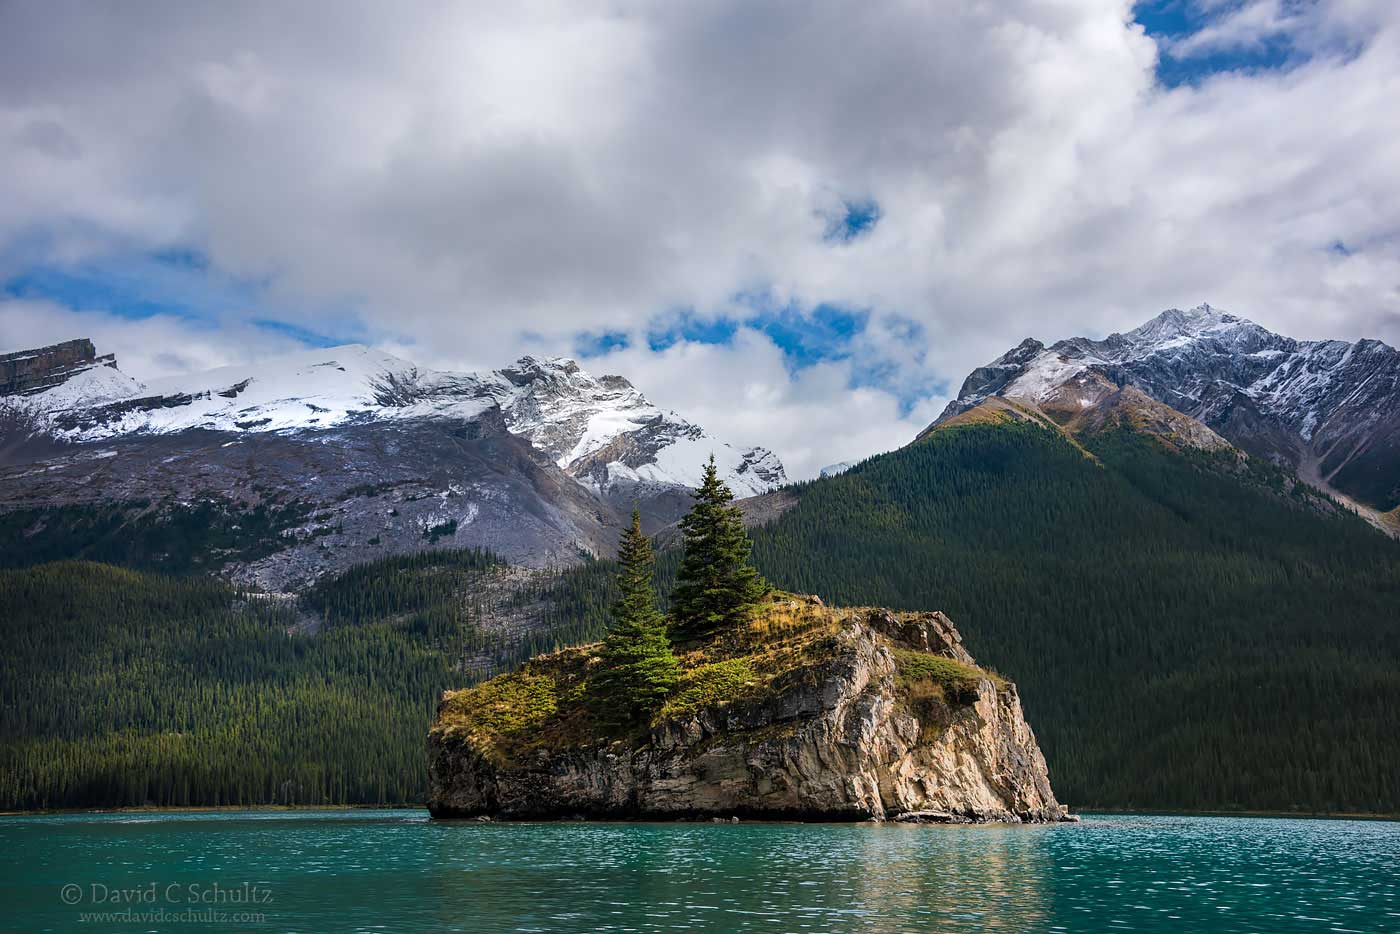 Maligne Lake, Jasper National Park, Canada - Image #125-553